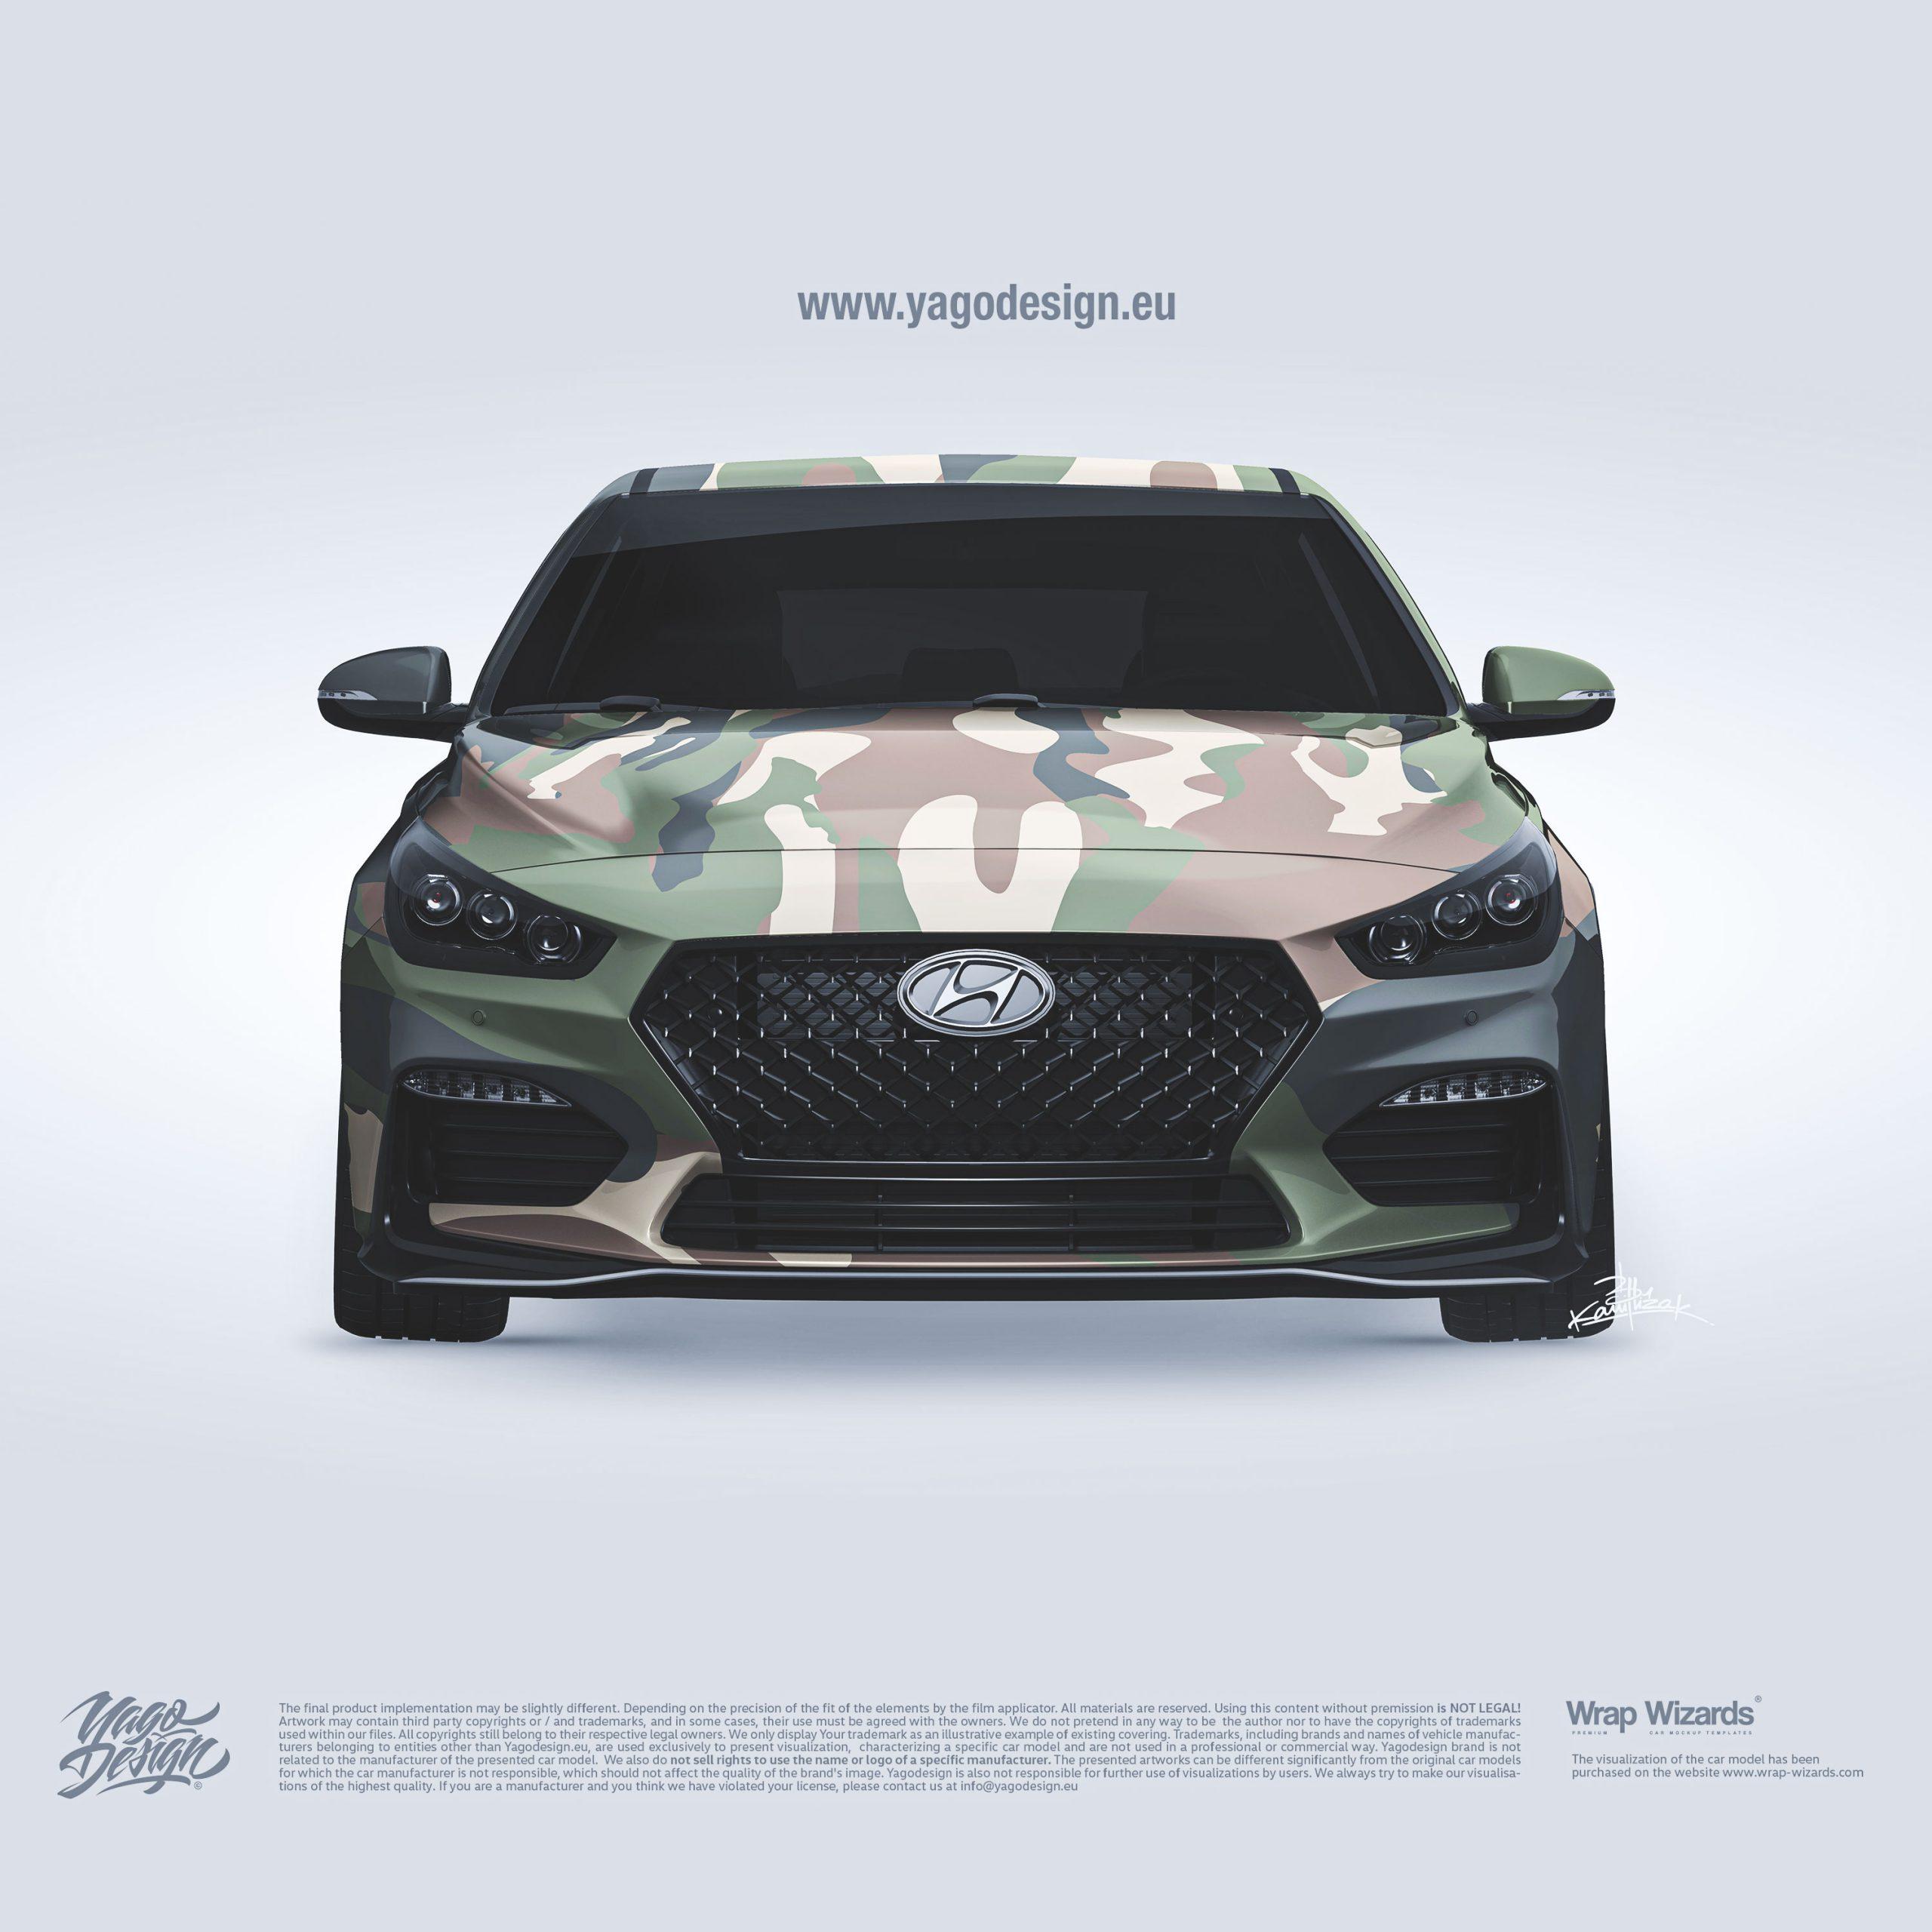 Hyundai-I30N-performance-by-Yagodesign-FV